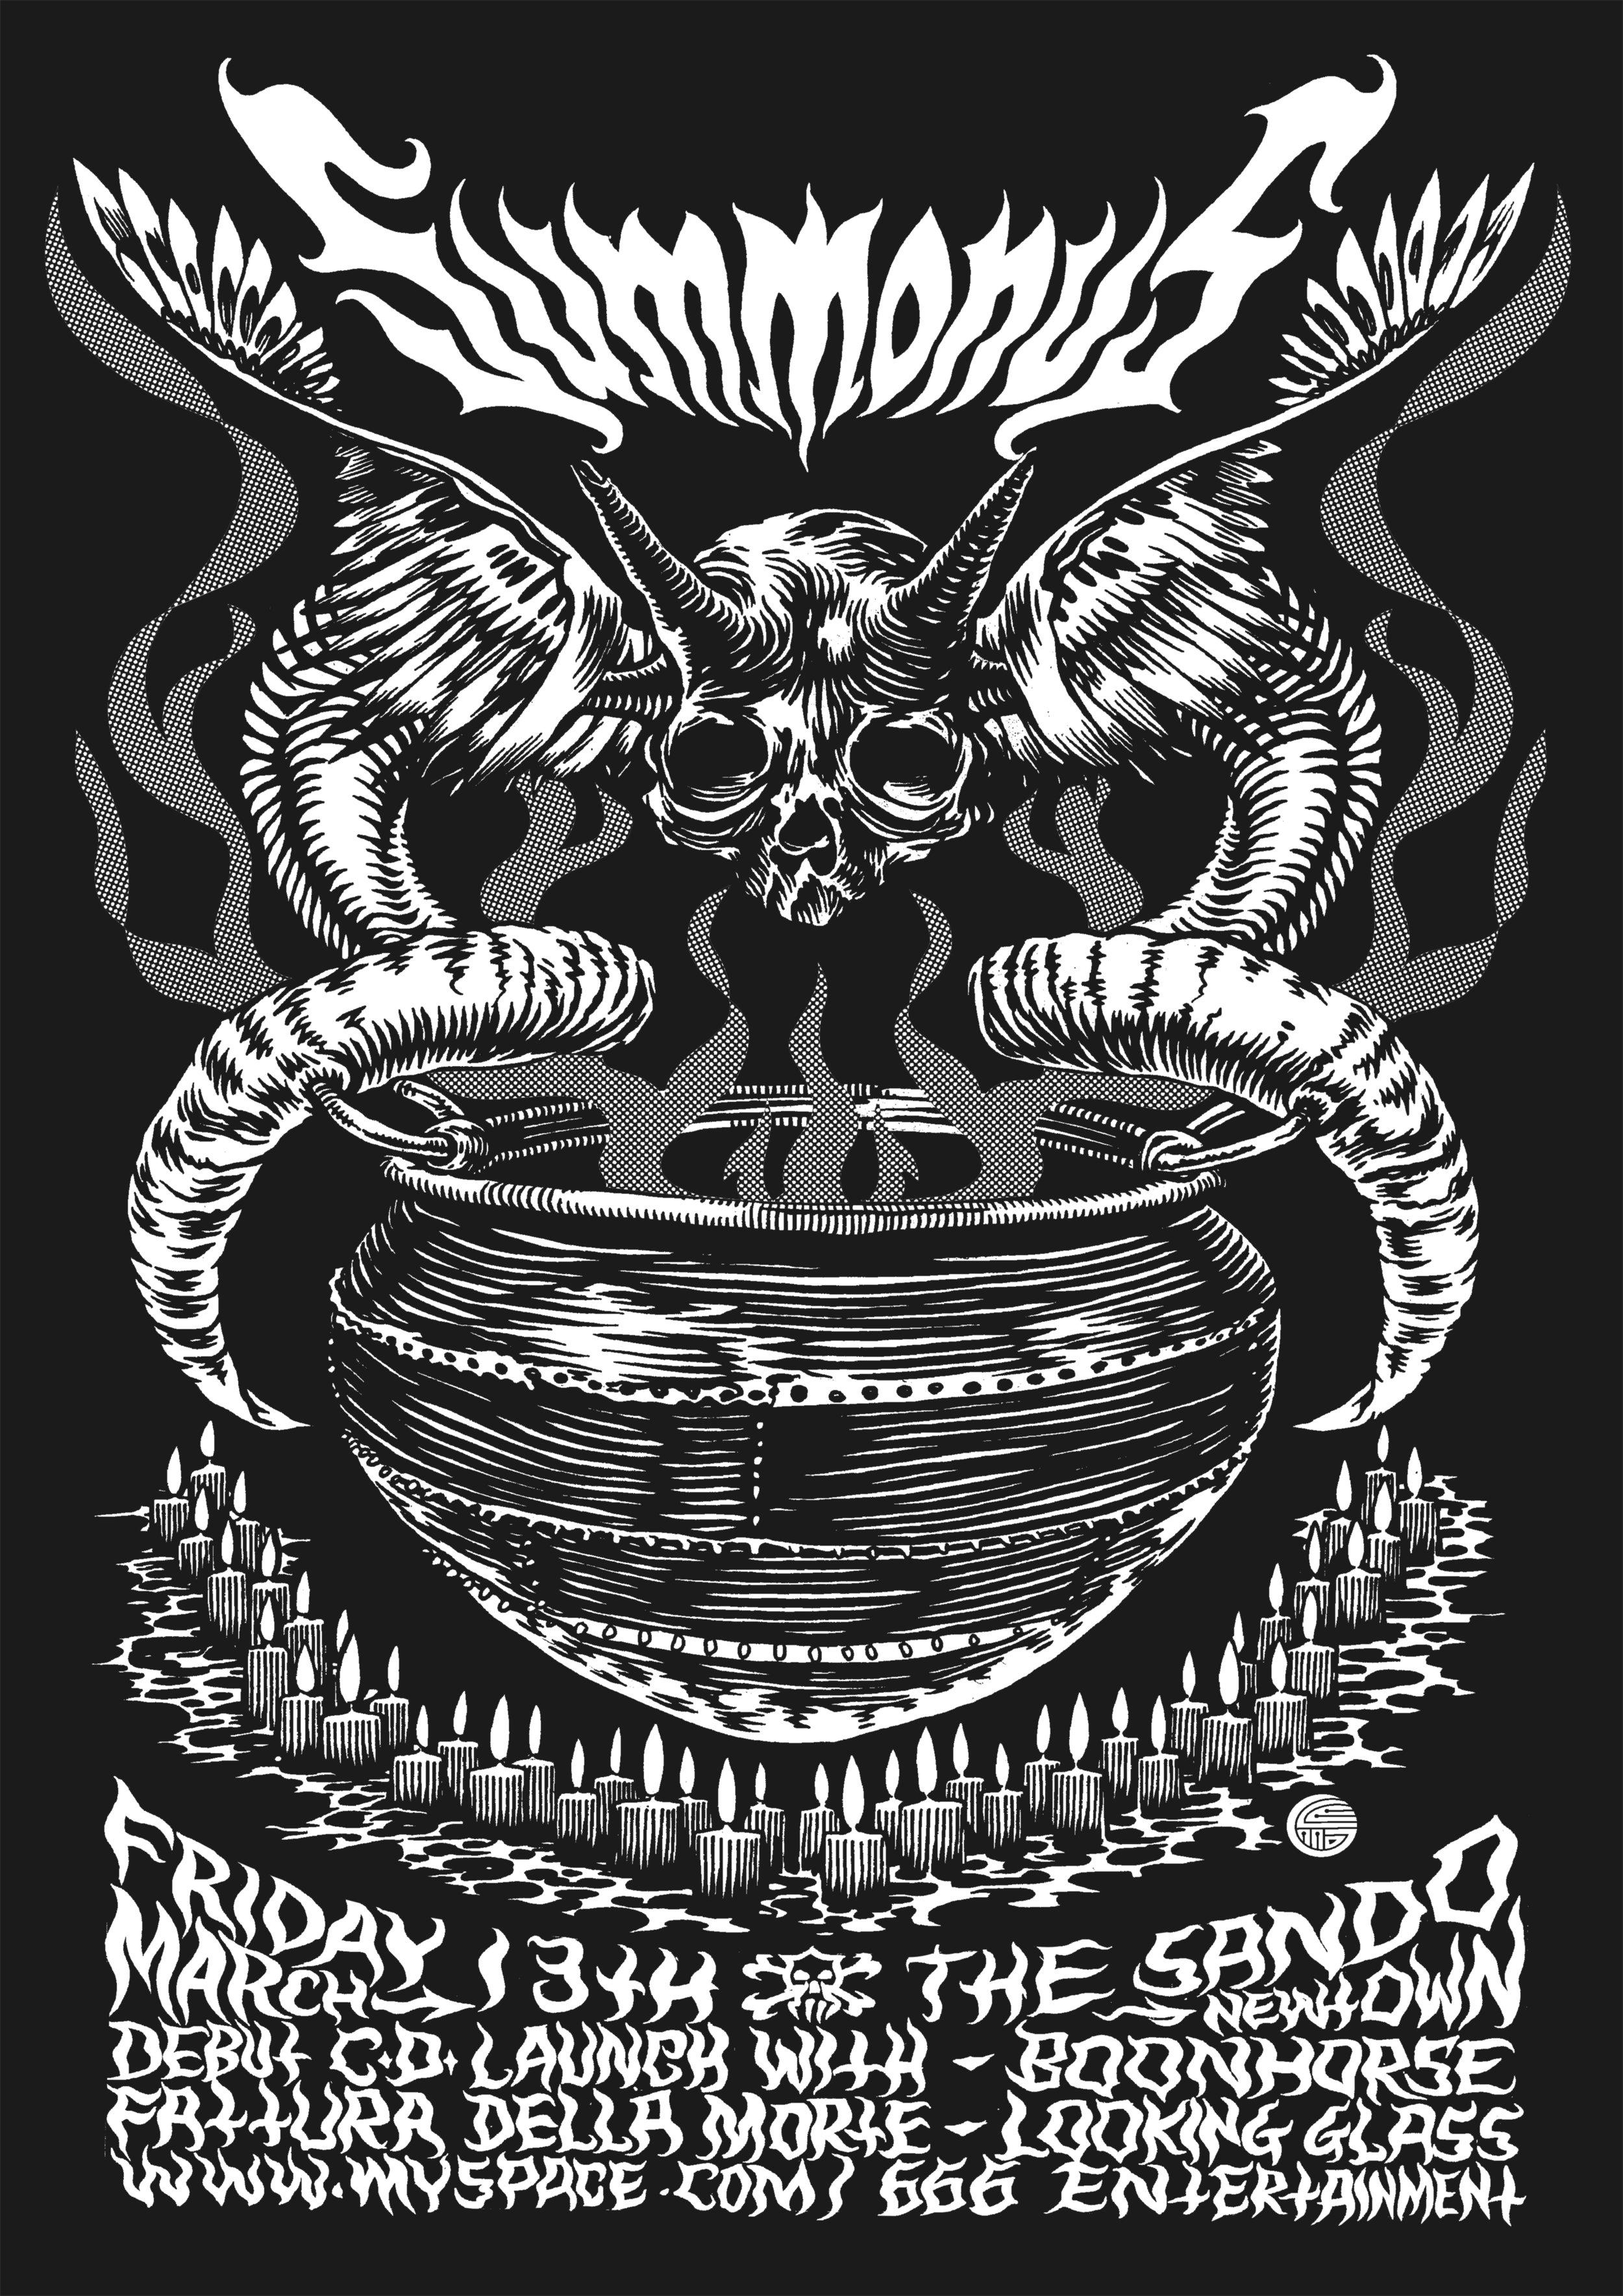 summonus cd launch poster.jpg